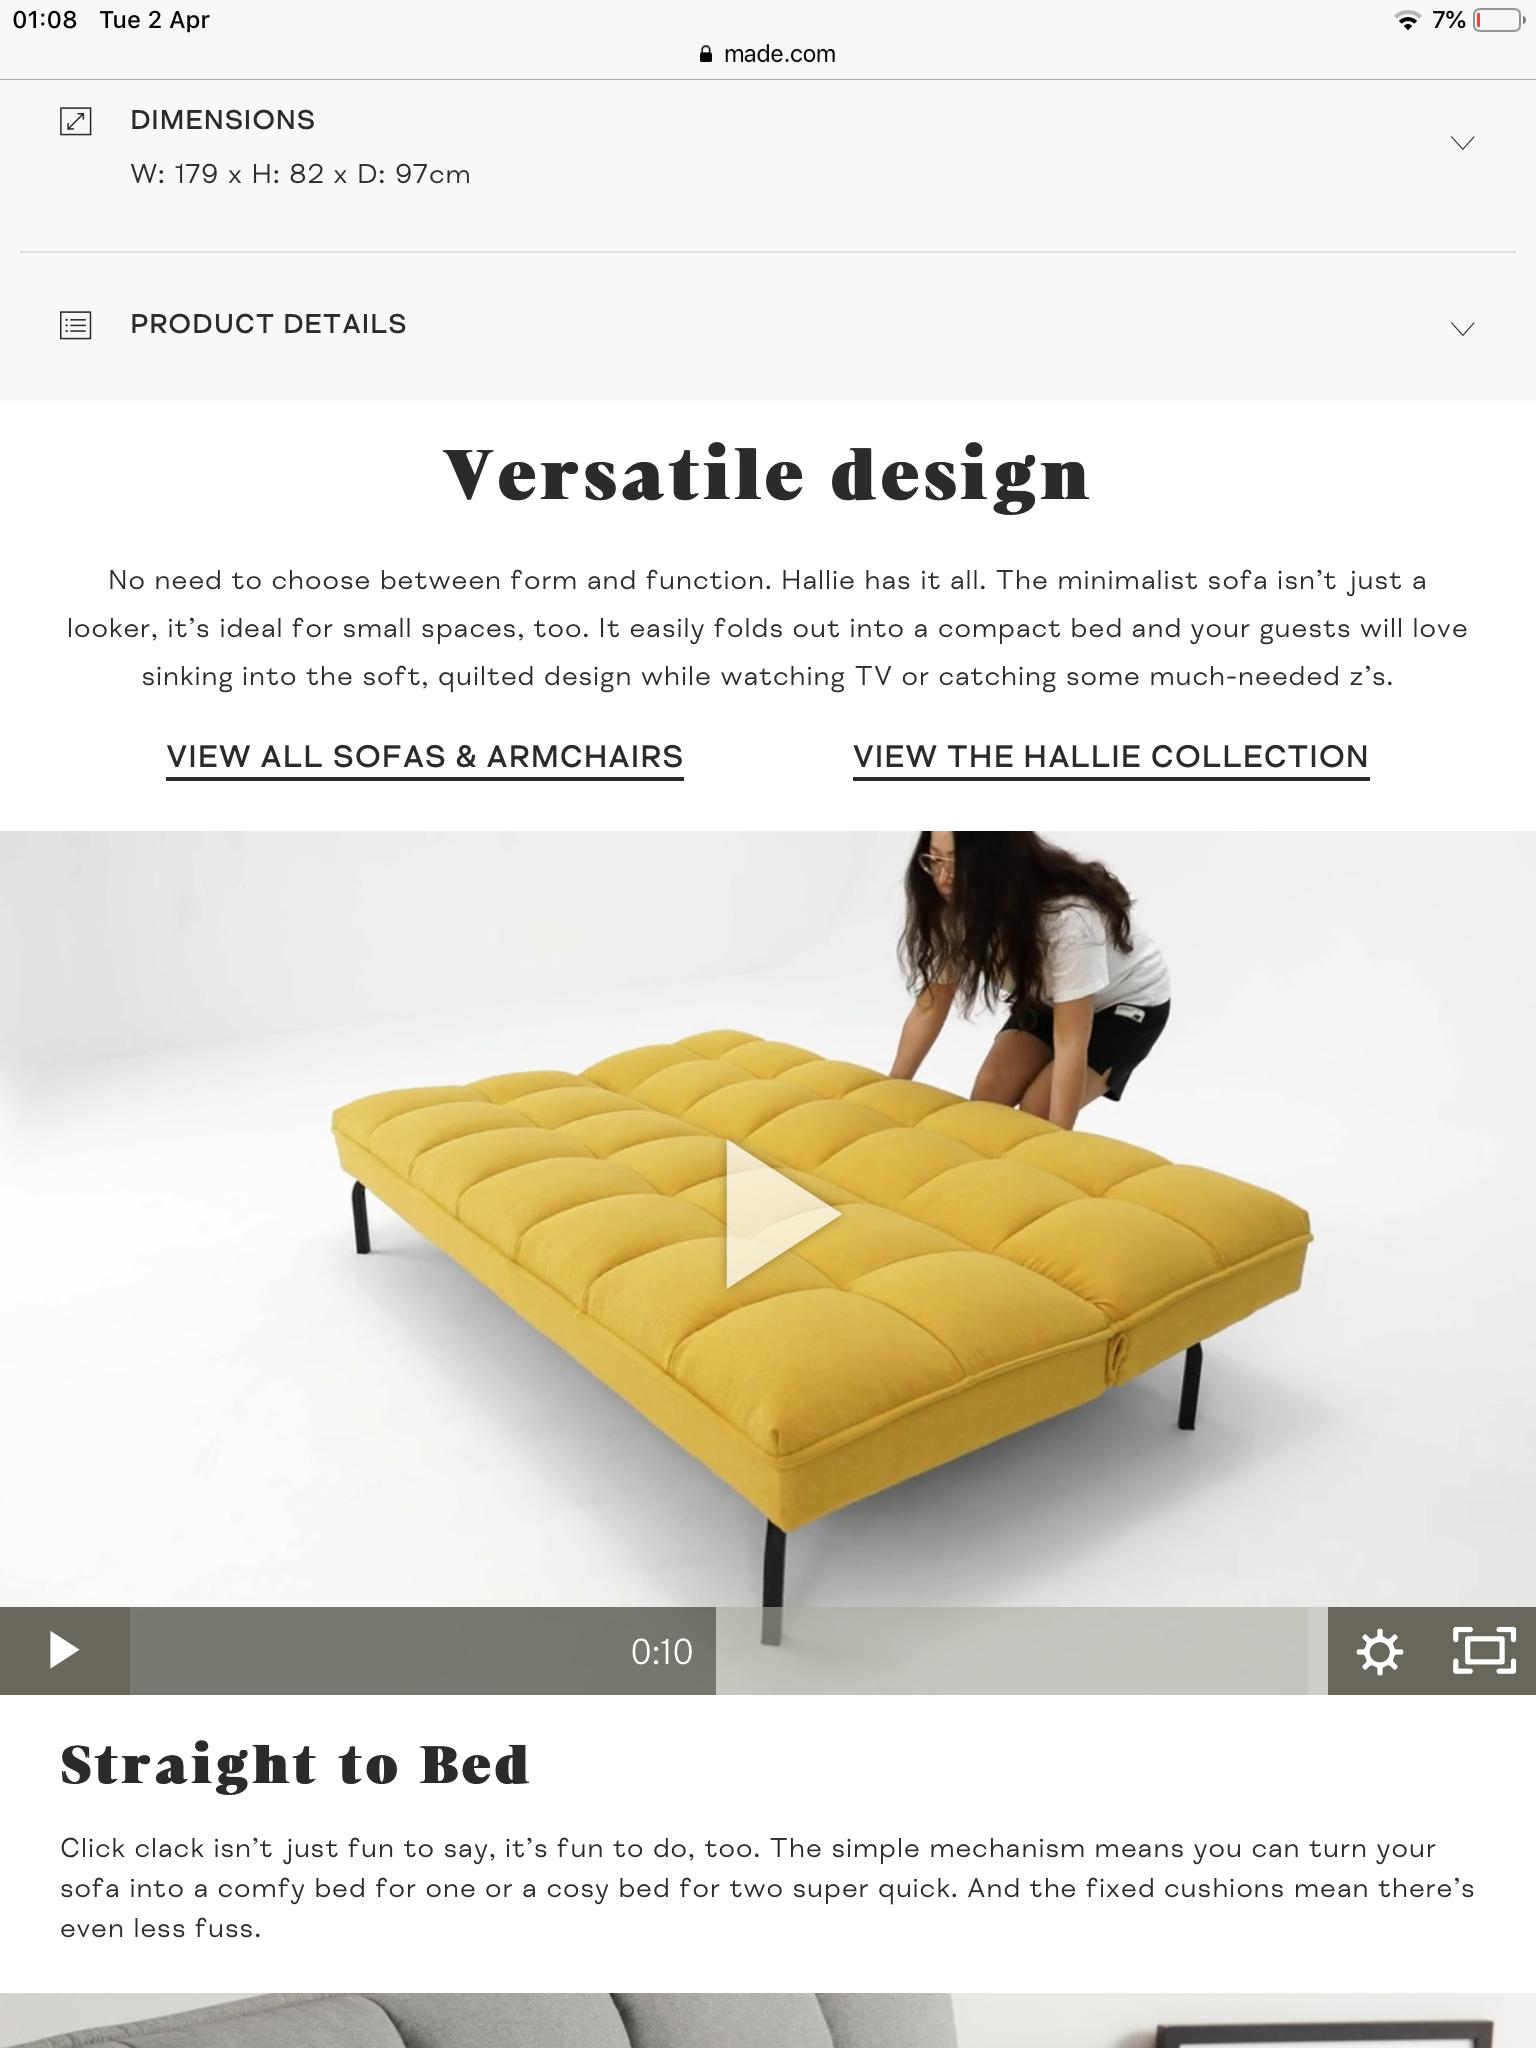 Pin by Gray on Attic Minimalist sofa, Small spaces, Design